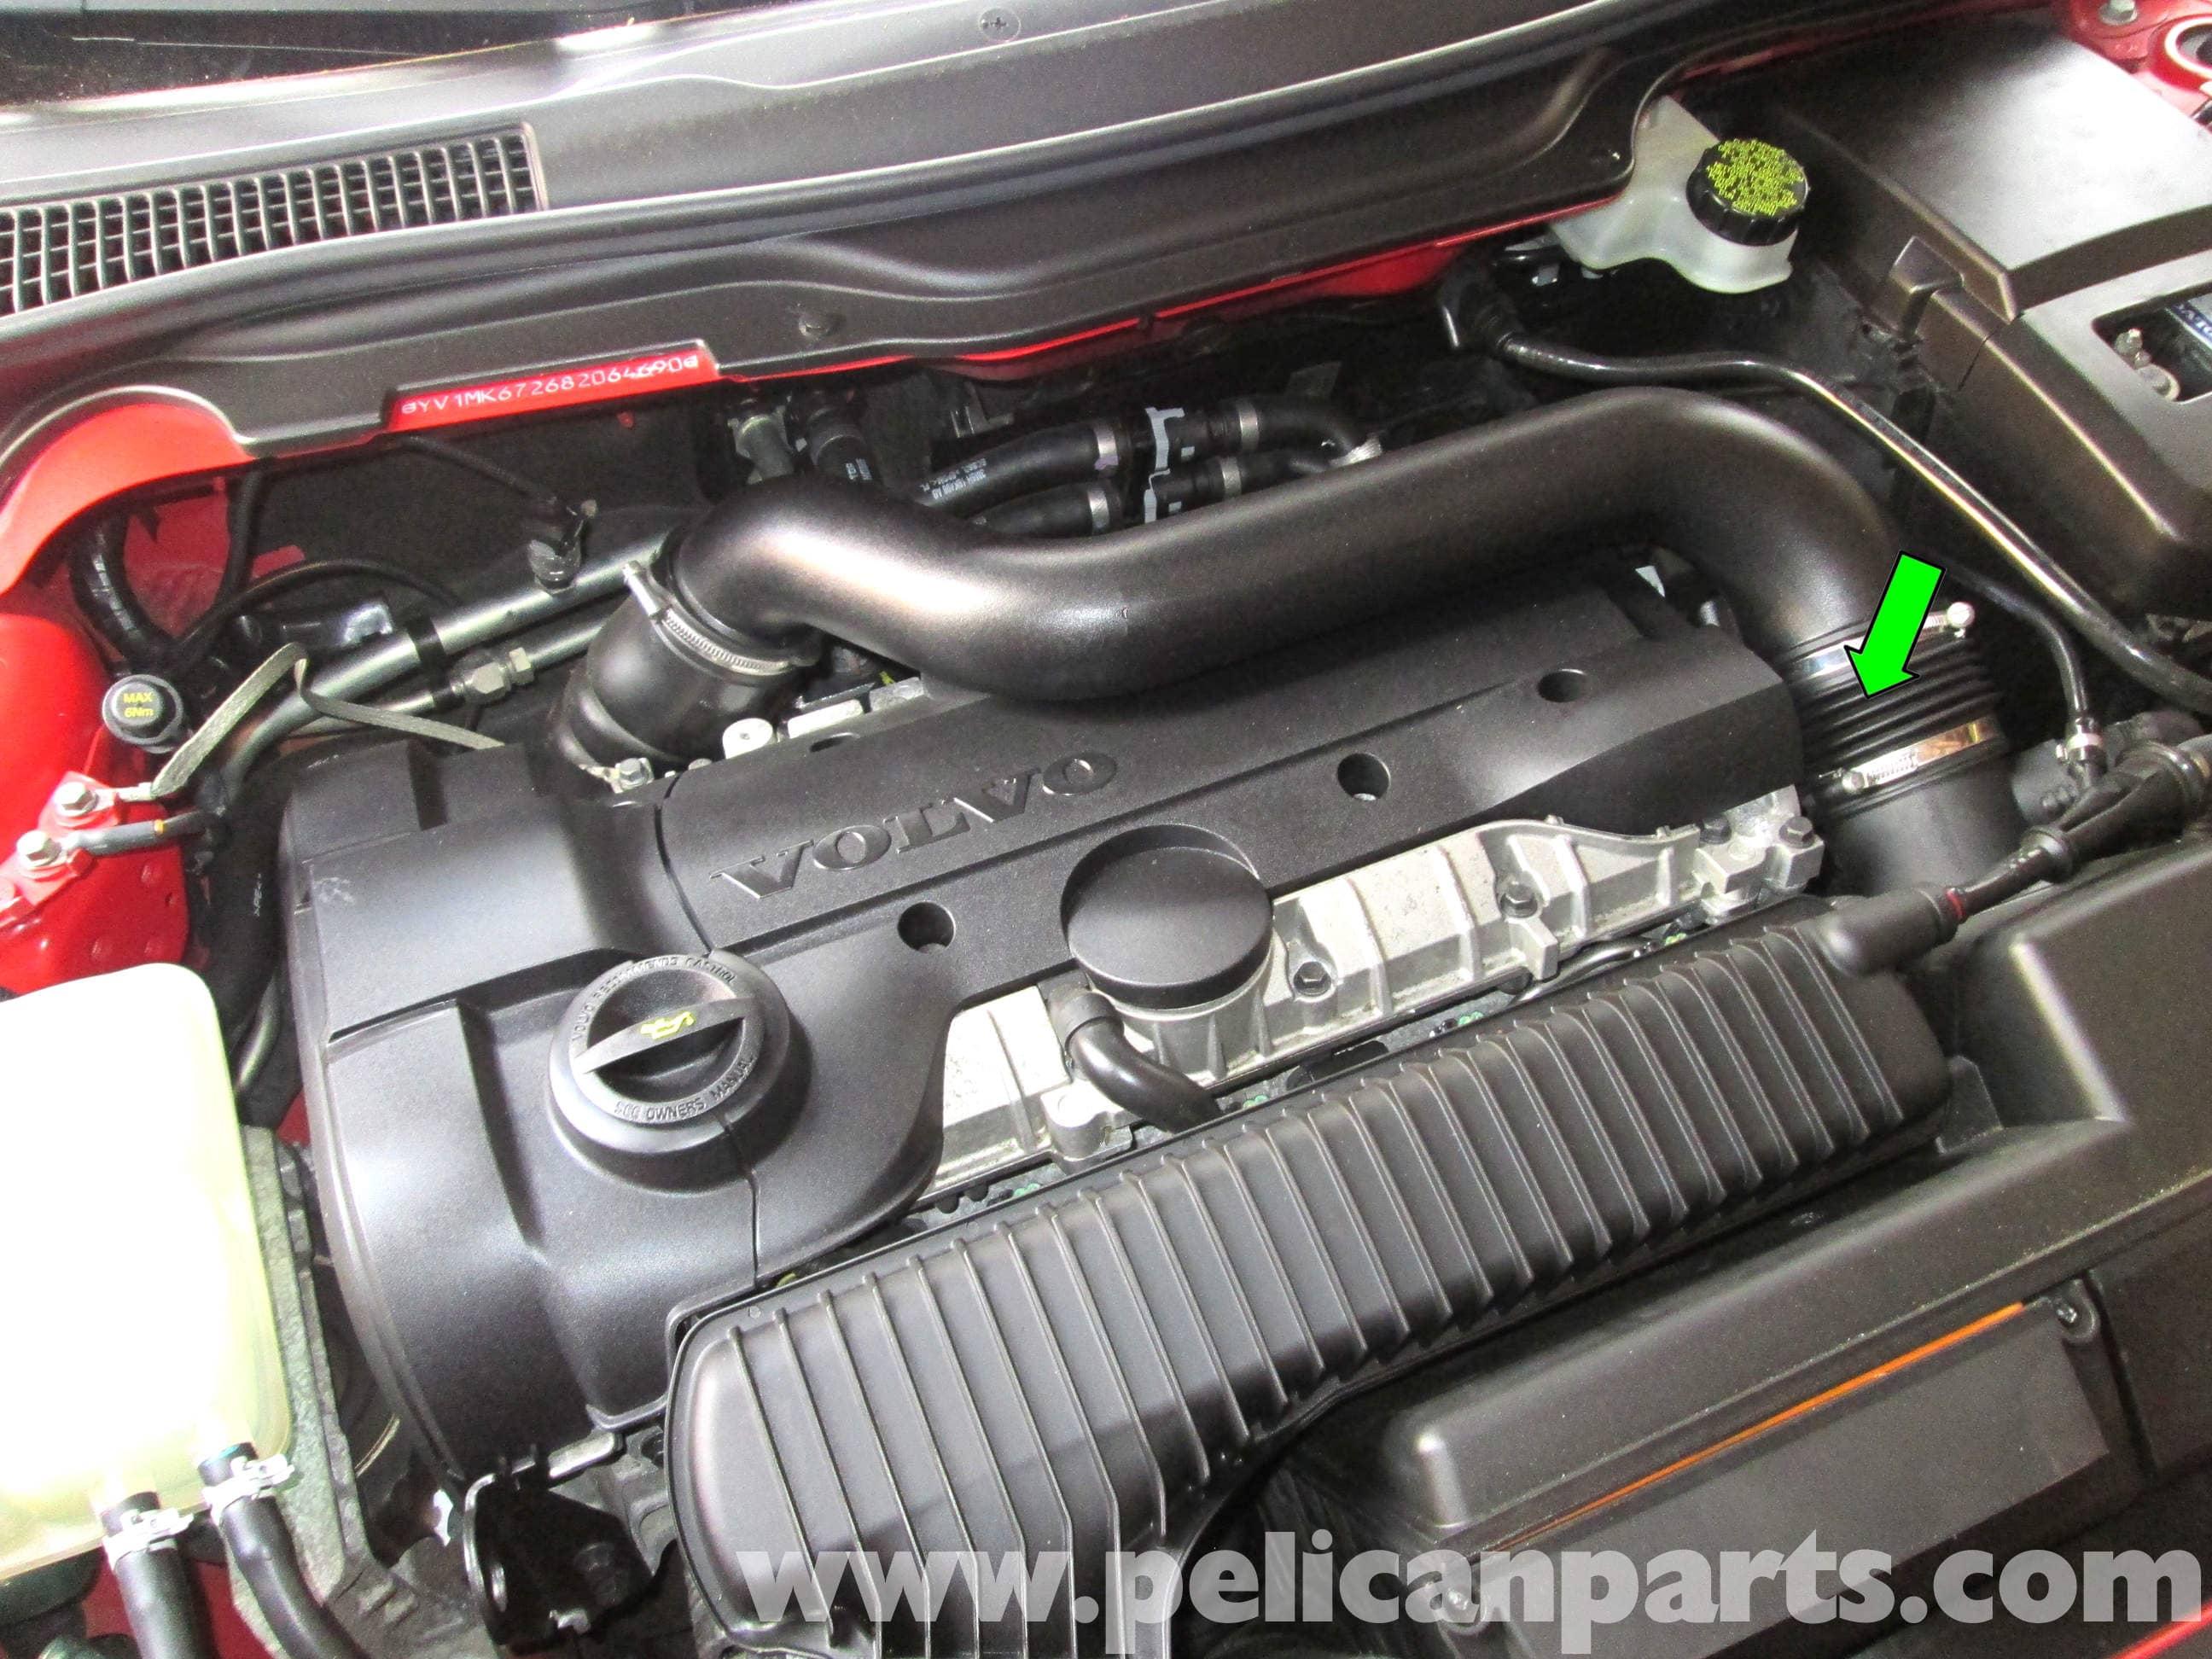 Volvo C30 Crankshaft Position Sensor Replacement (2007 ...